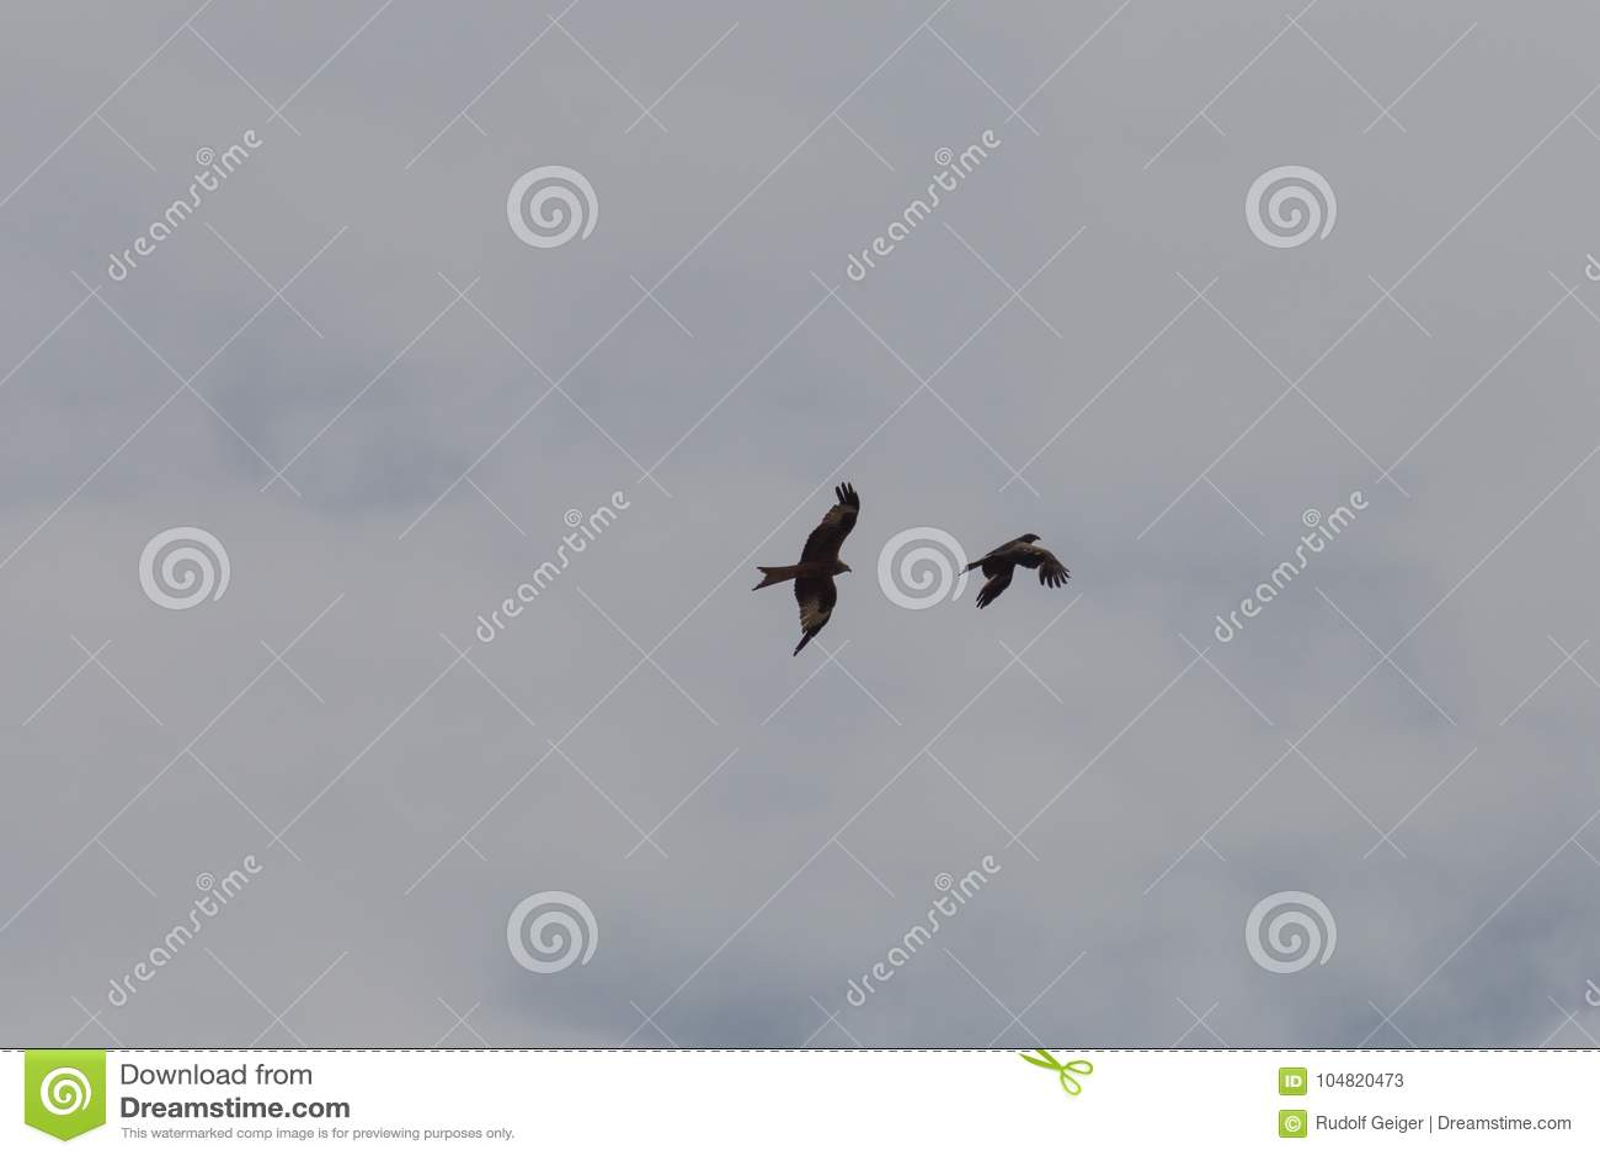 bird of prey as couple in summer blue sky